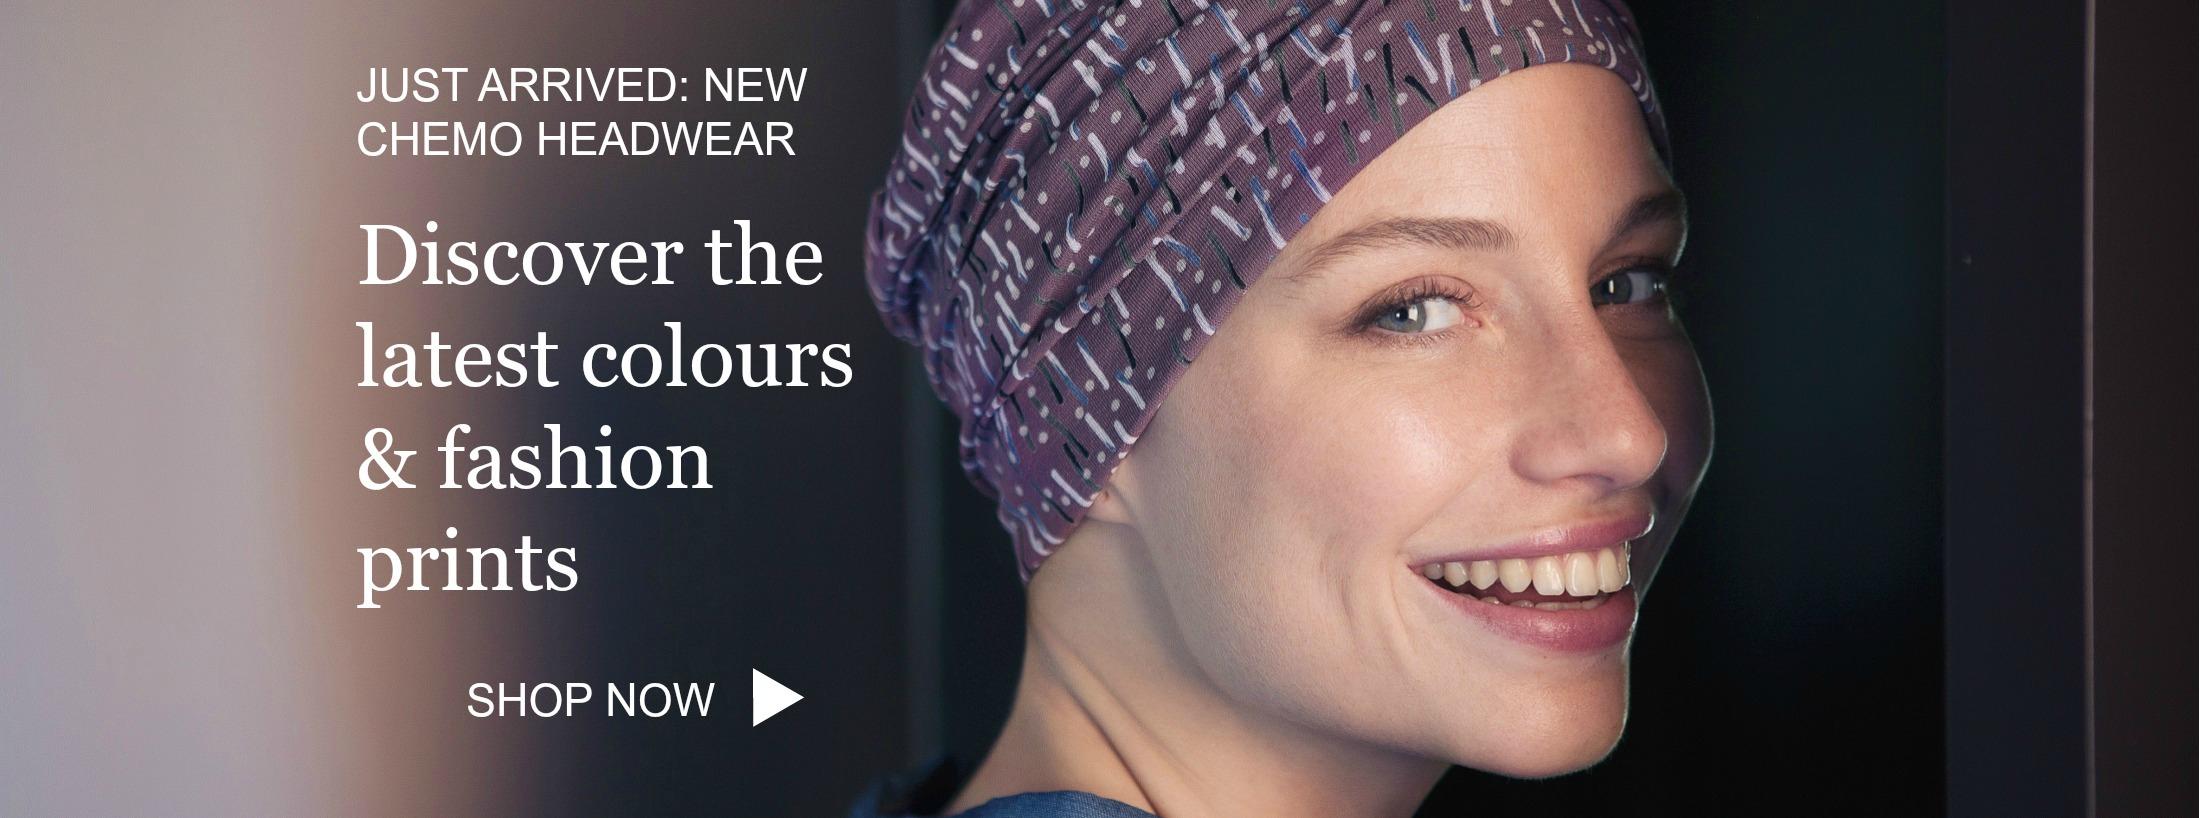 new chemo turbans